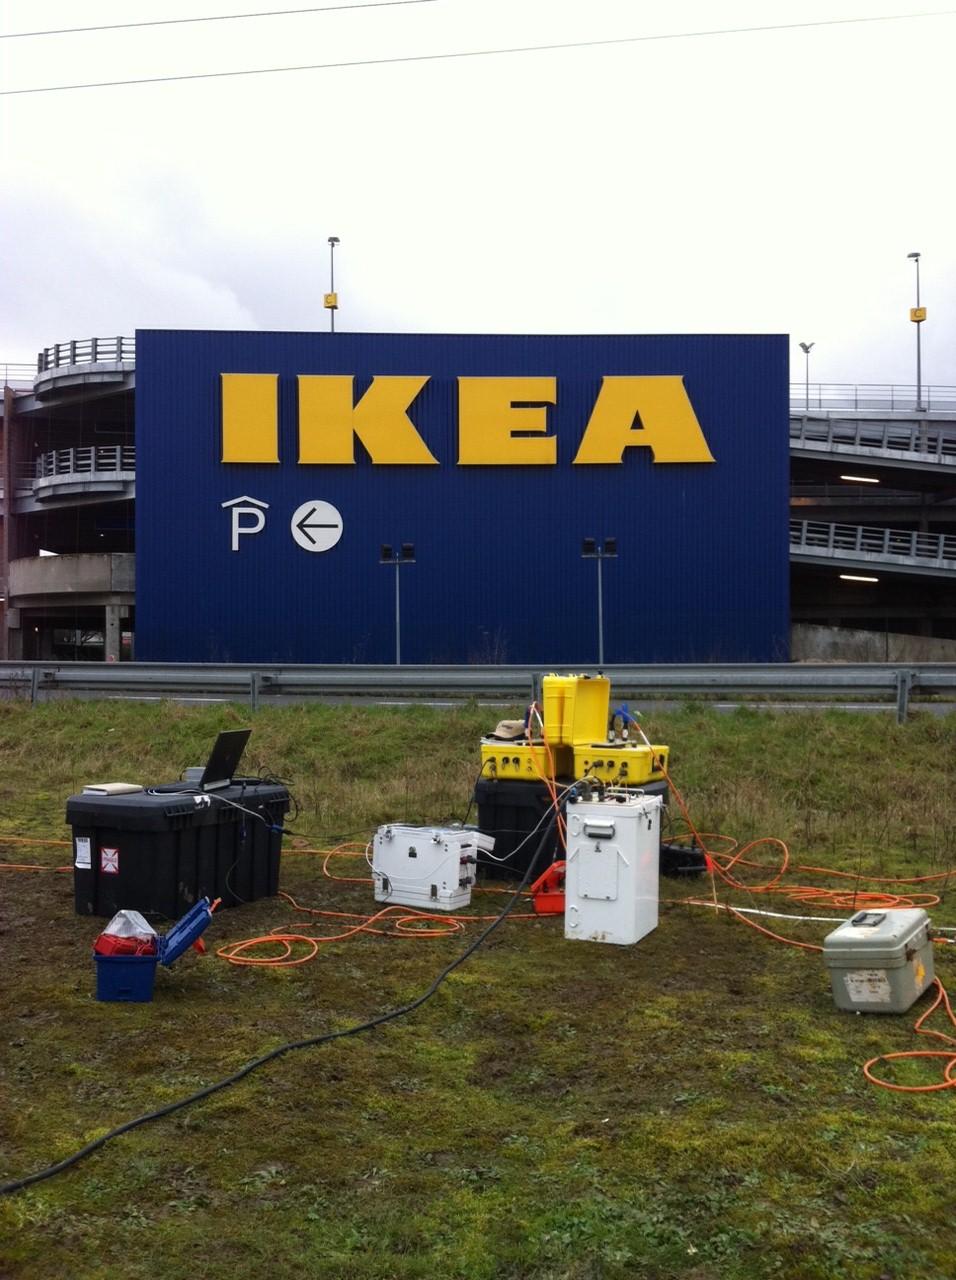 http://zonge.com/wp-content/uploads/2011/11/IKEA-ZETA-survey-fr-Nordine.jpg